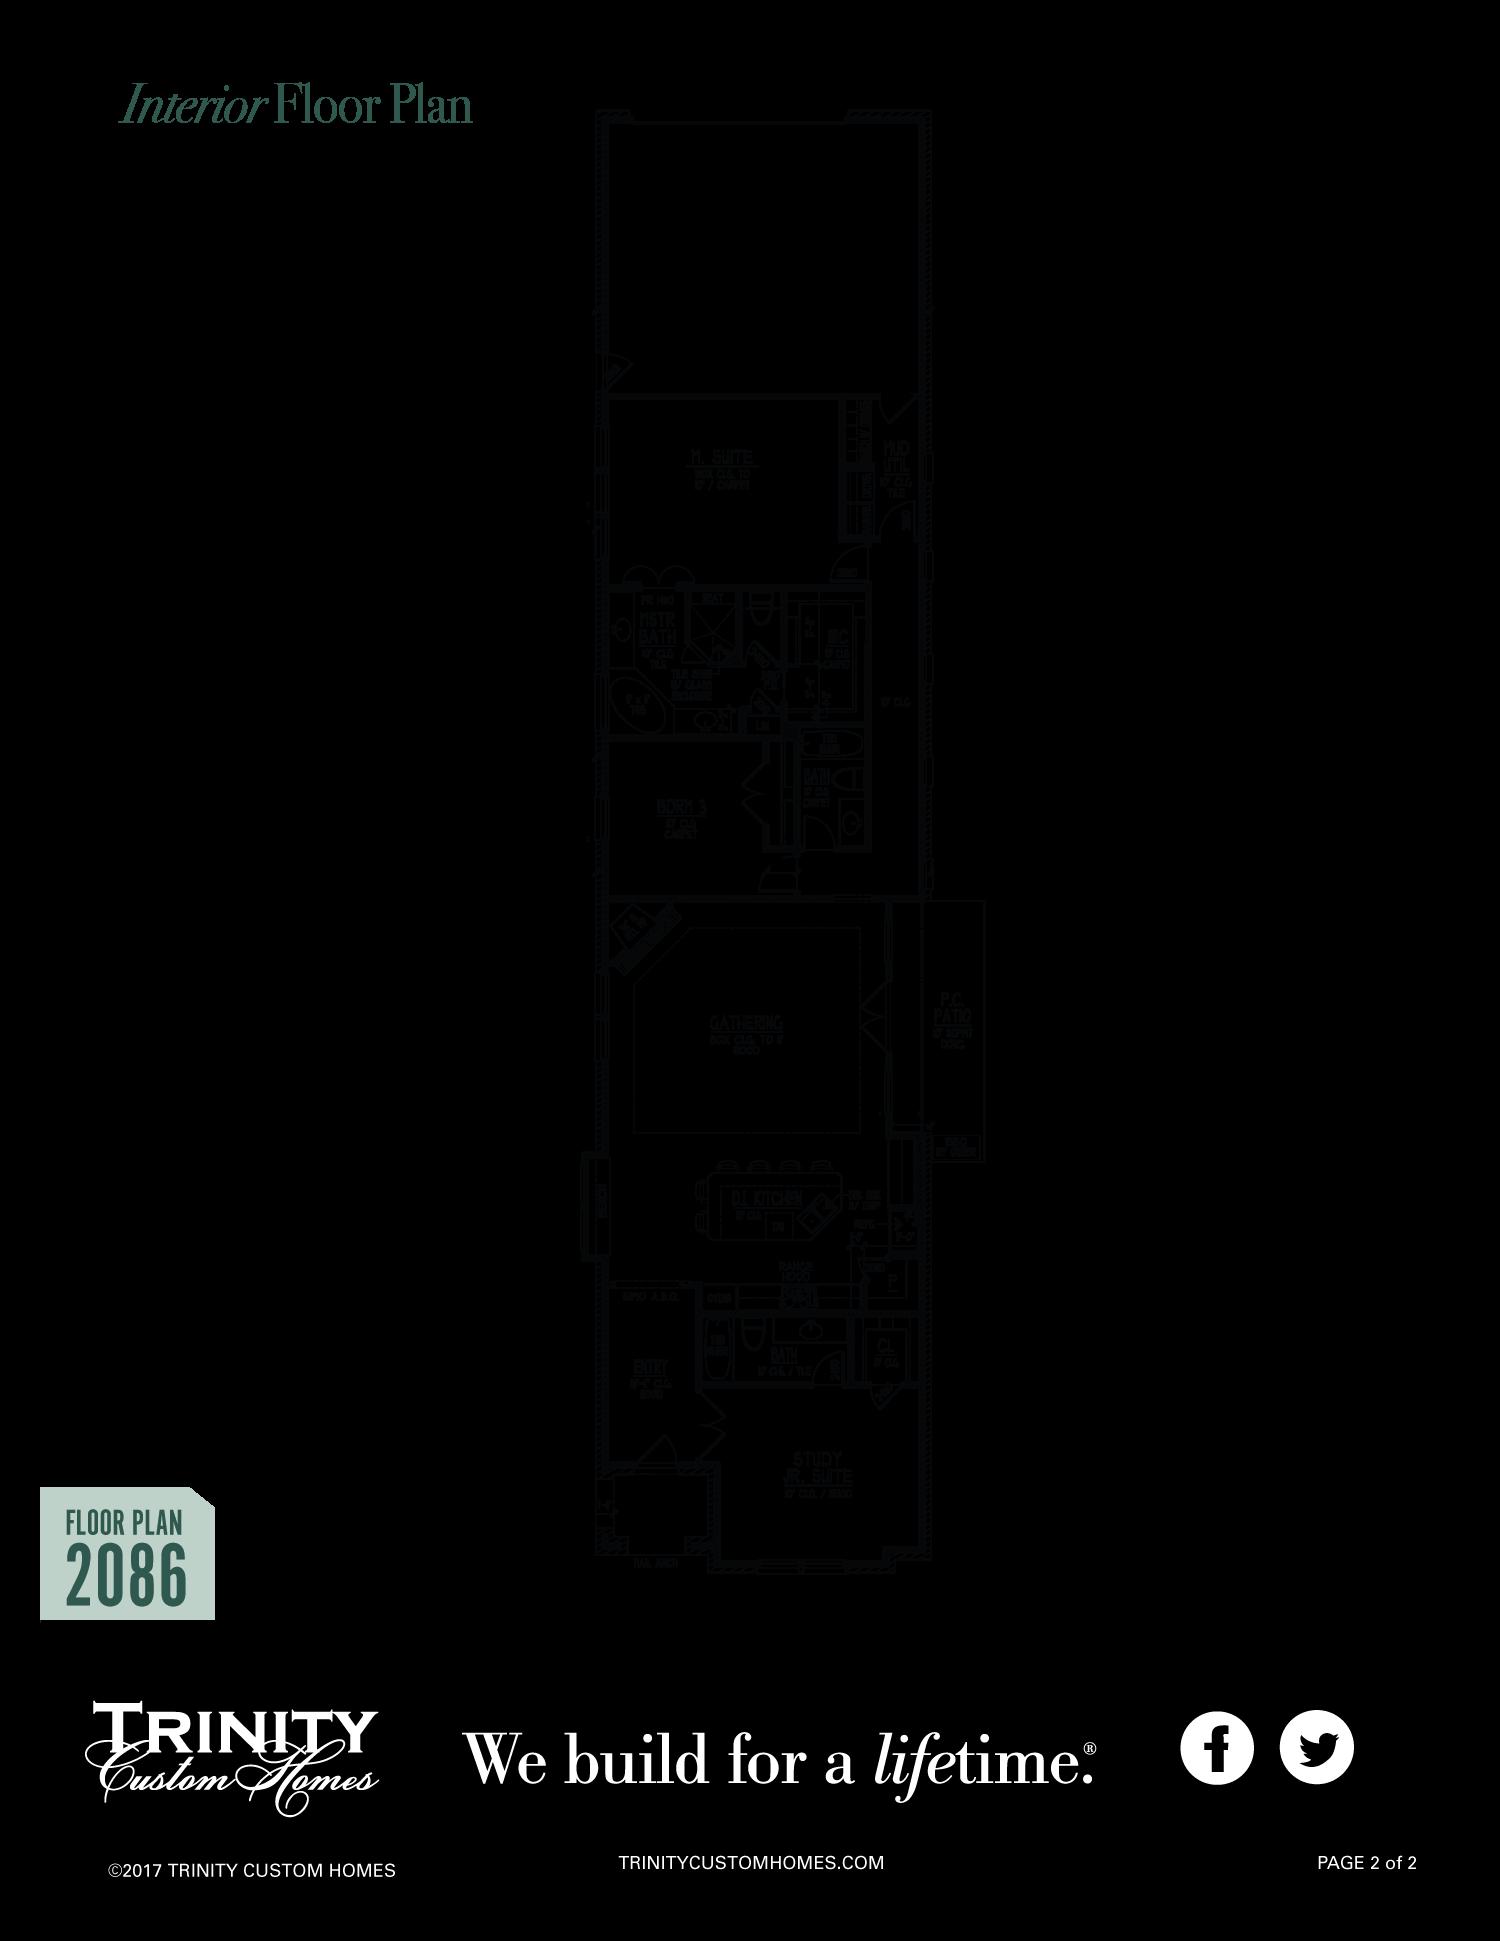 FloorPlan2086